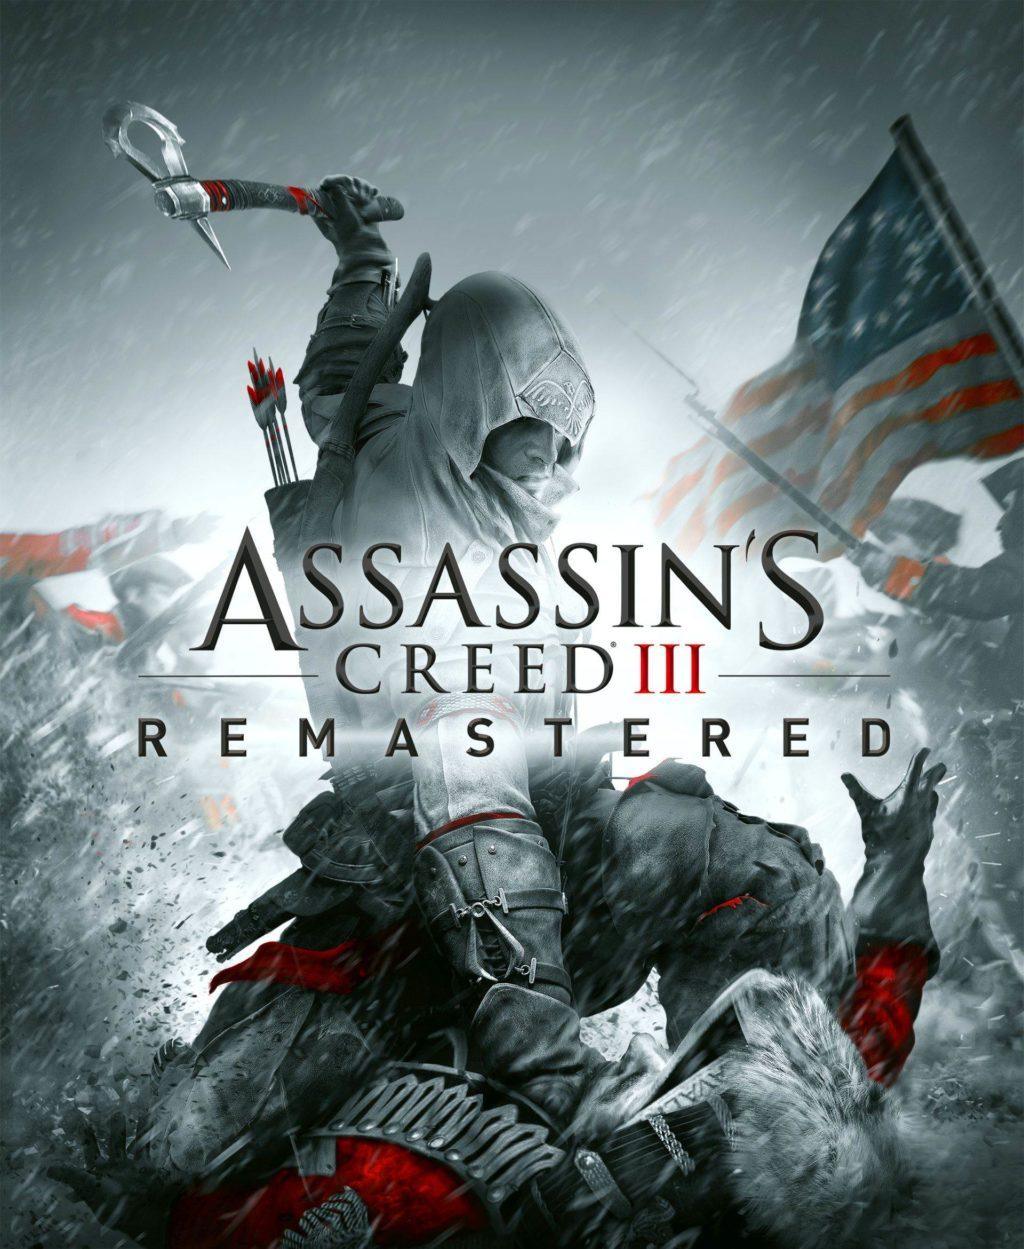 Assassins-Creed-3-Remastered-Bild-5-1024×1249